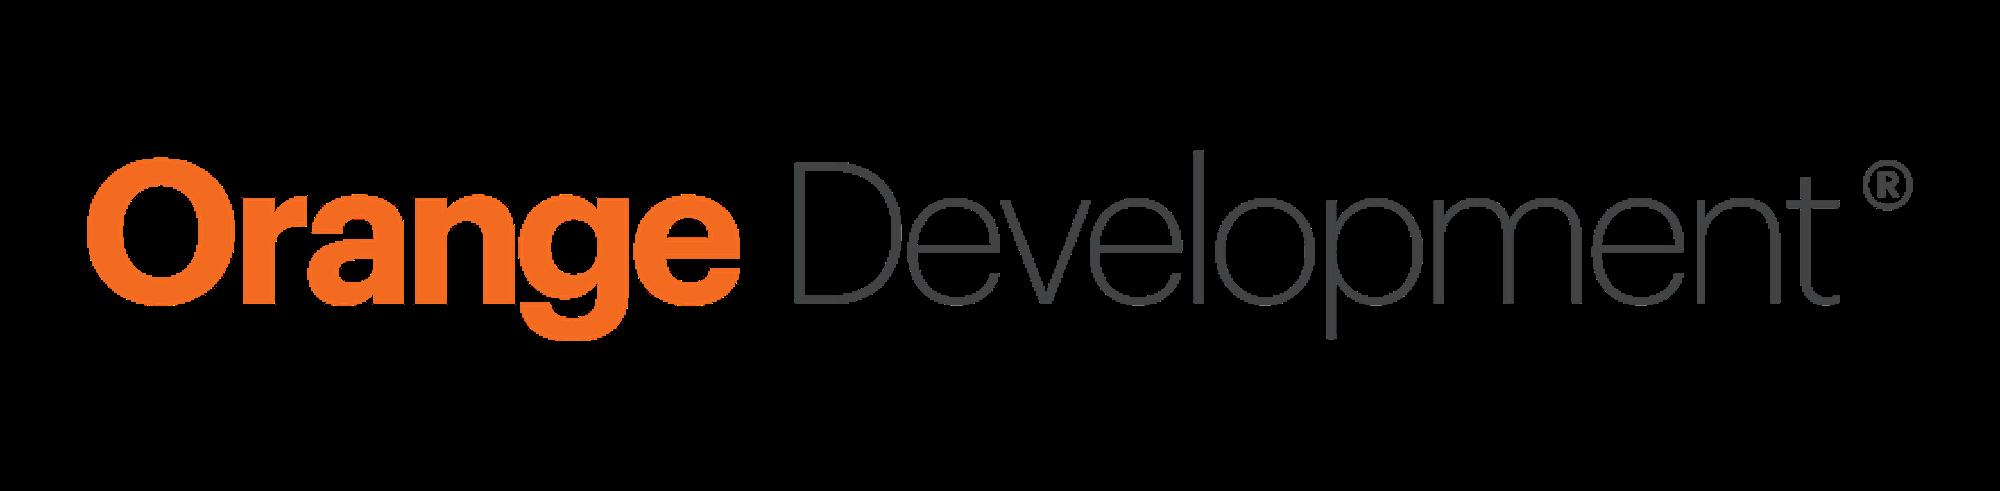 Orange Development logo